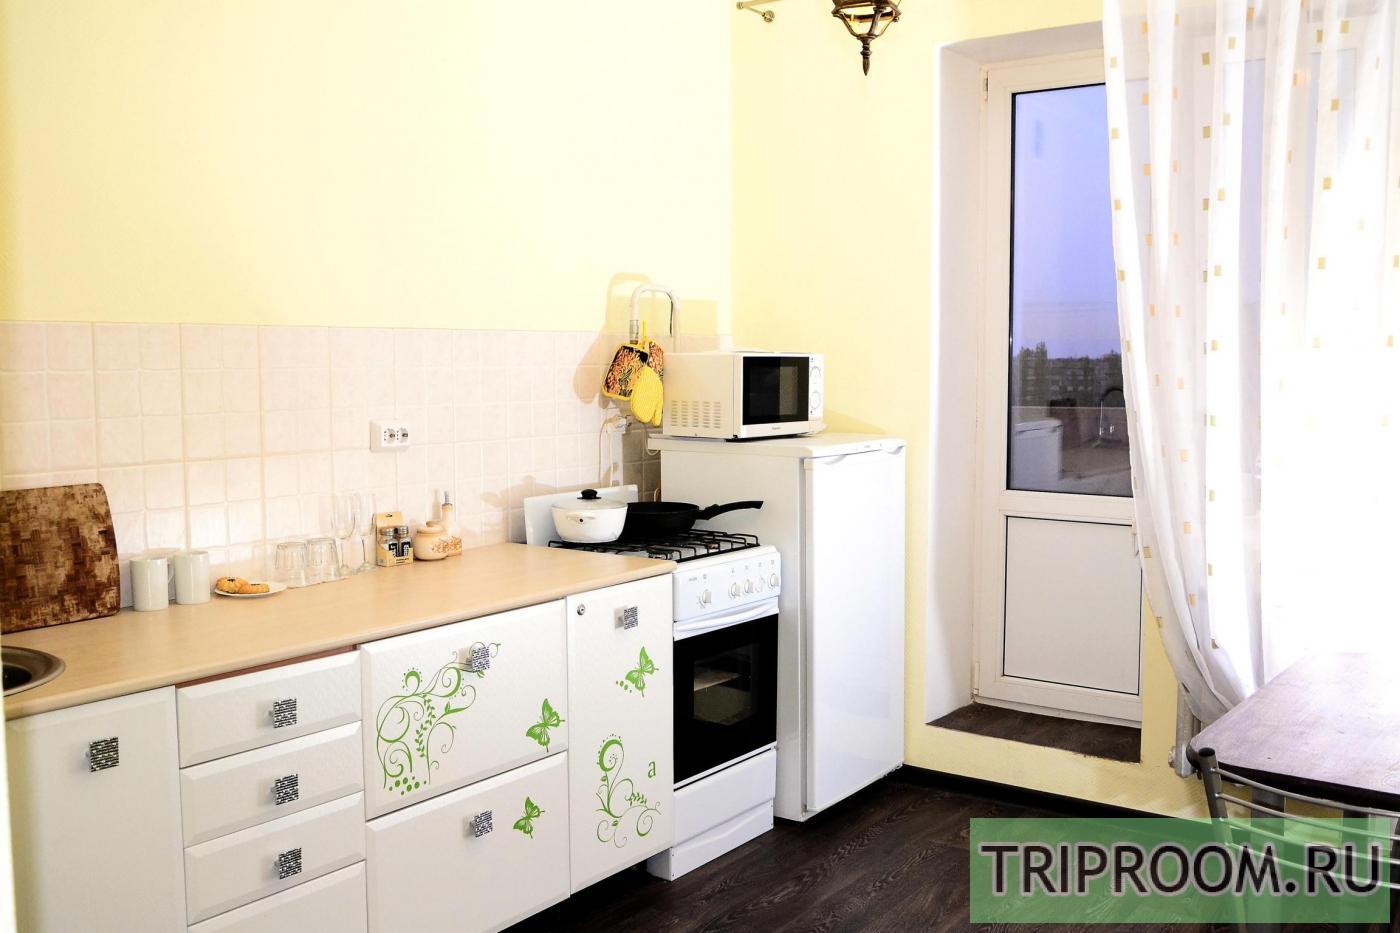 1-комнатная квартира посуточно (вариант № 14713), ул. Петра Смородина улица, фото № 7